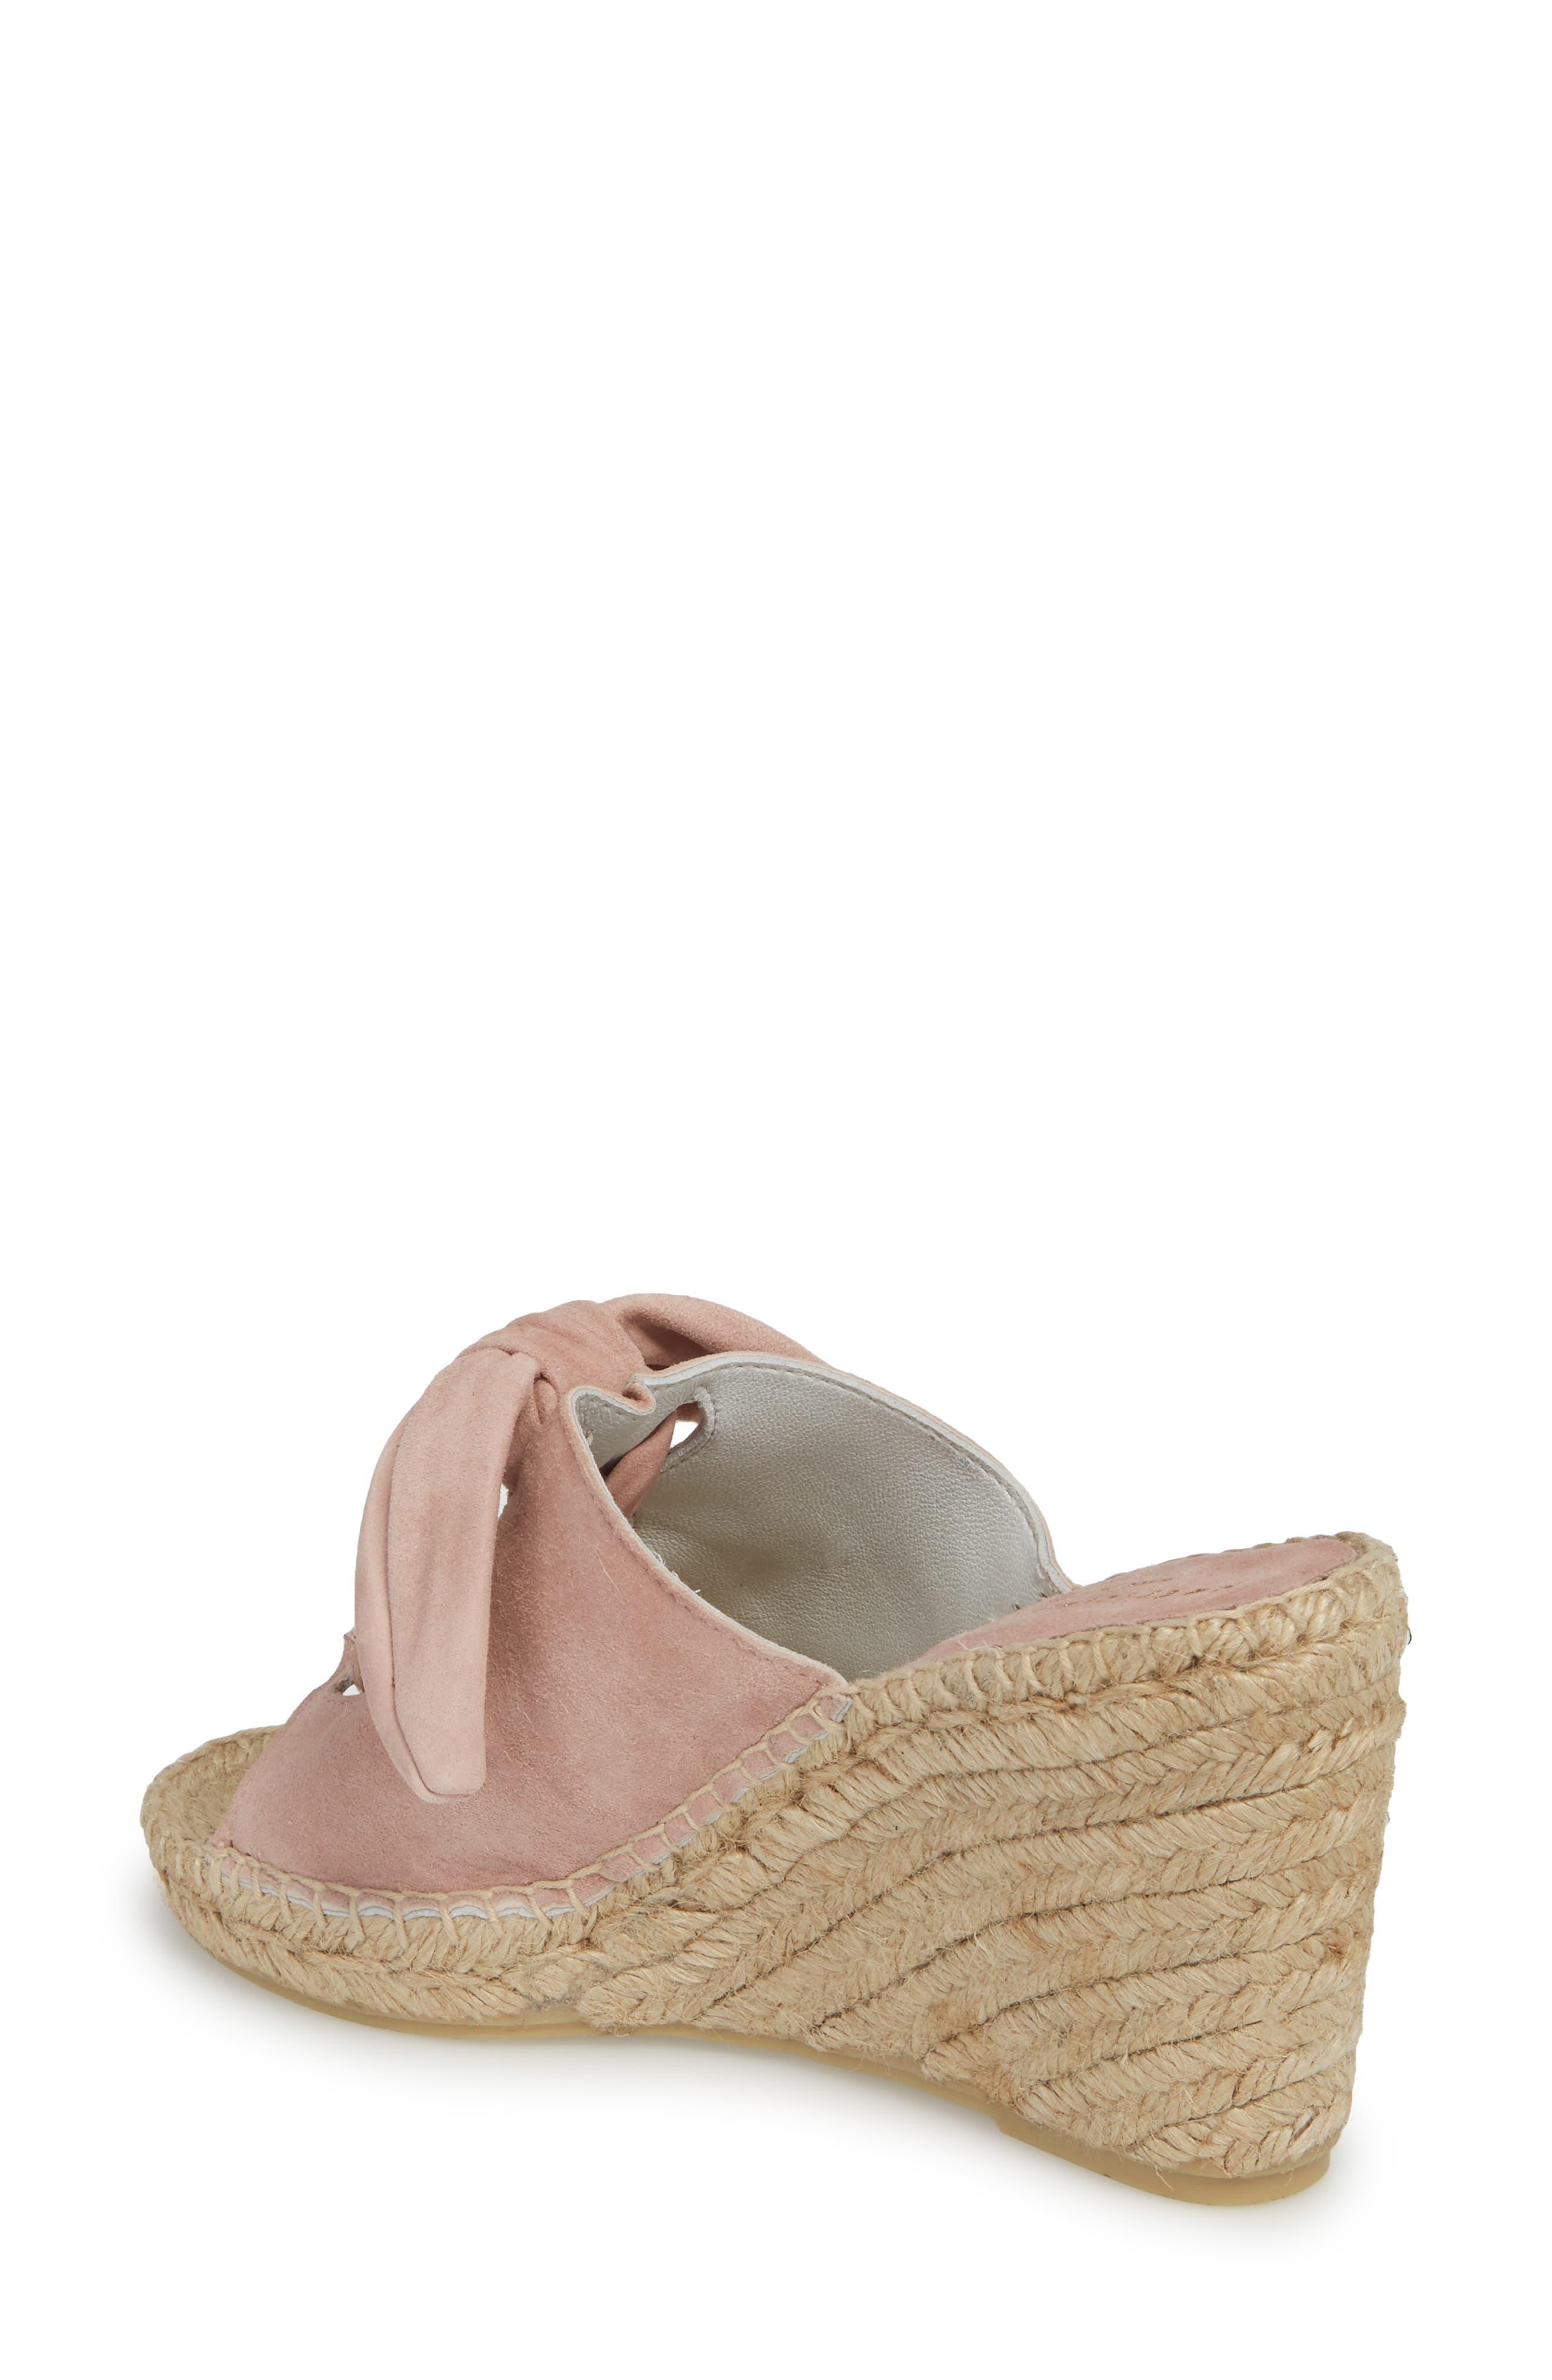 Flirt Espadrille Wedge Sandal,                             Alternate thumbnail 2, color,                             Pink Suede